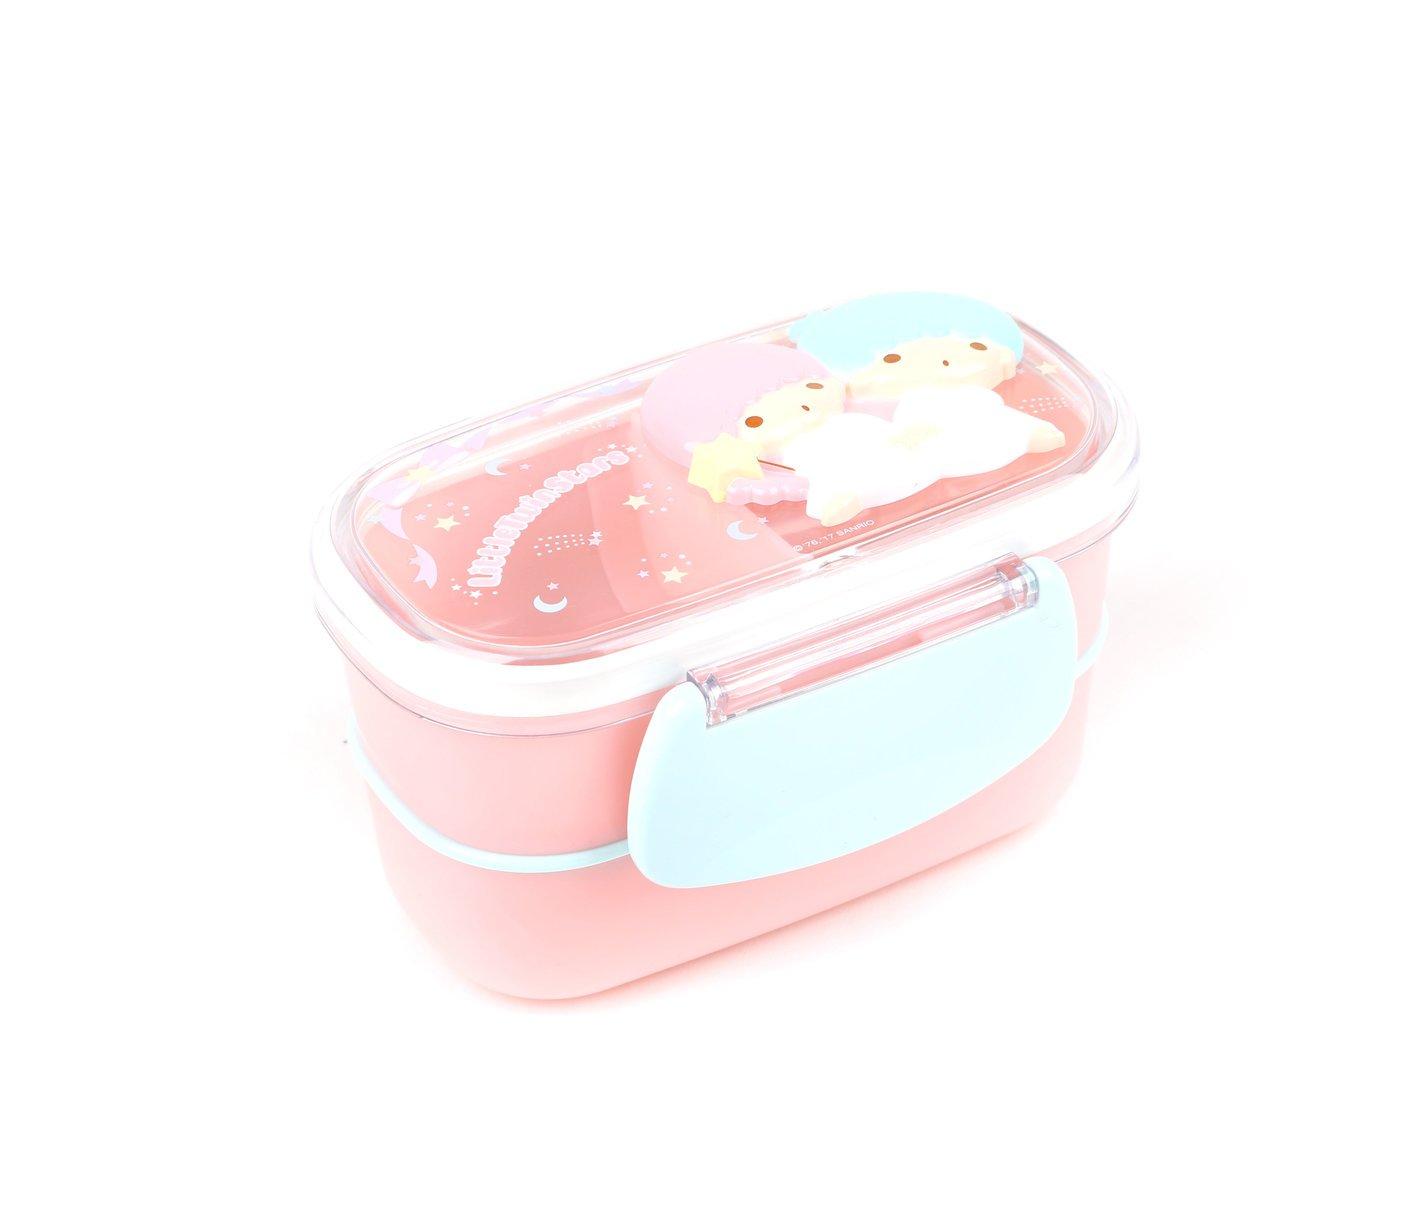 Little Twin Stars Die-Cut 2-Tier Lunch Container: Stars Sanrio